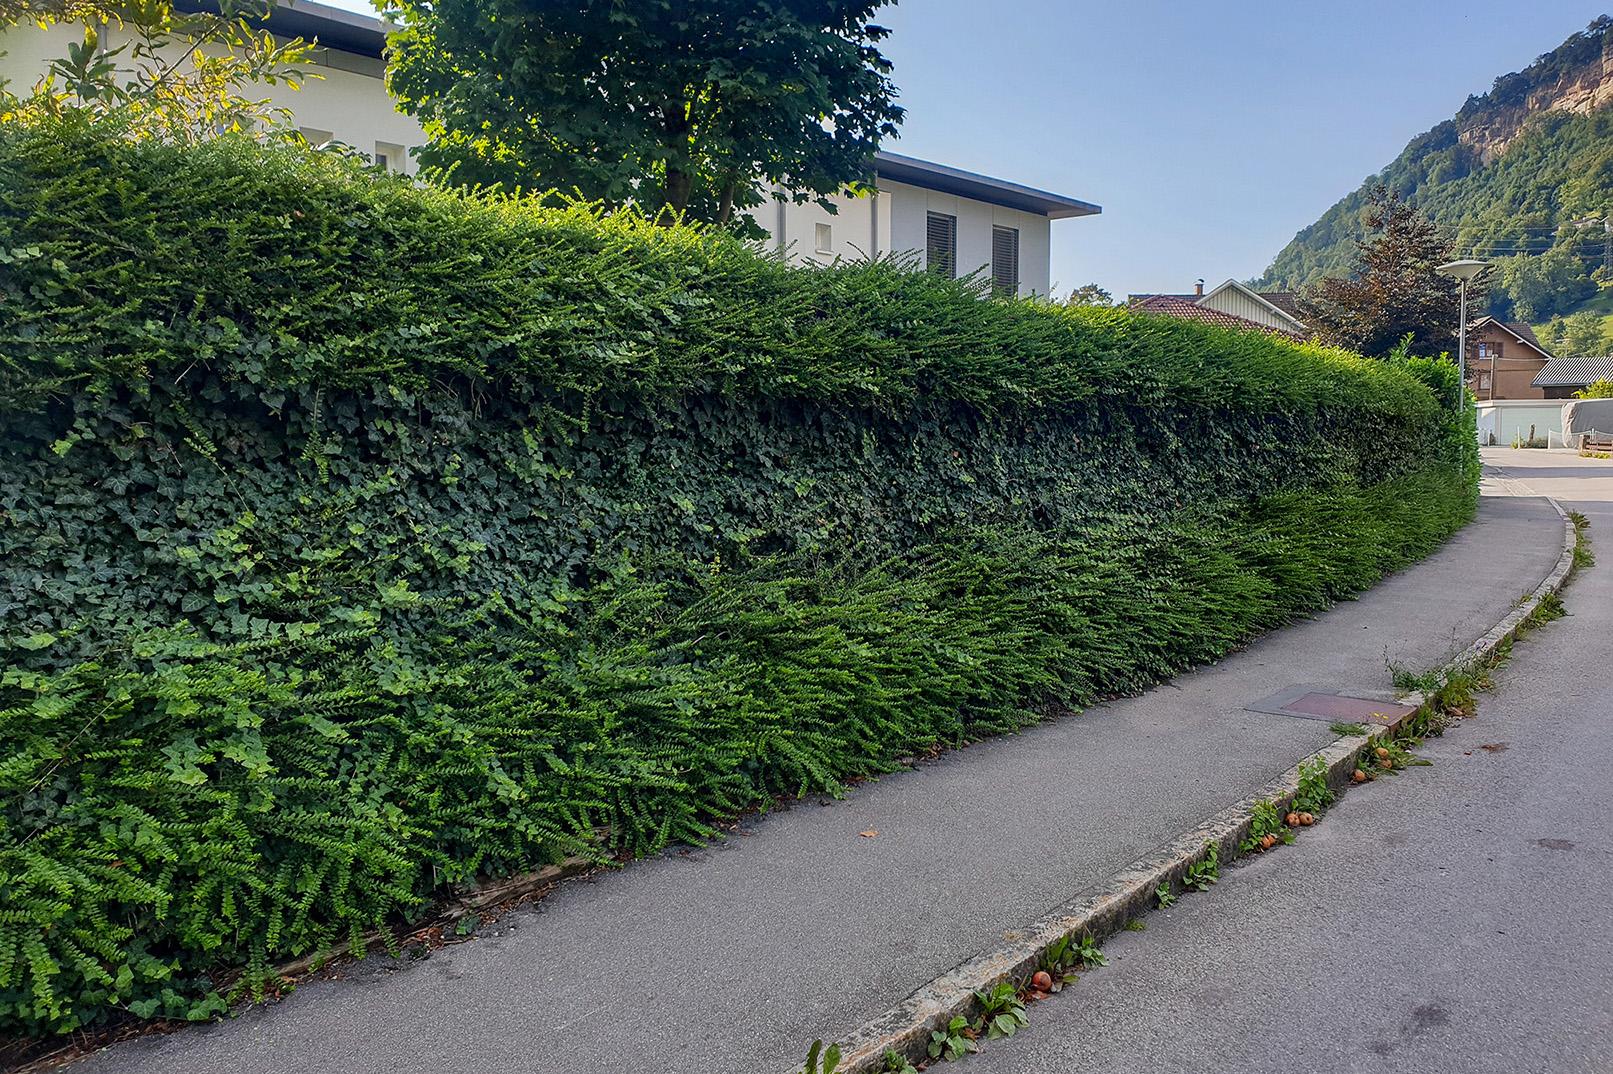 Bloomfeld_Zahrensdorf_Naturawall_Bregenz_ohneRosen